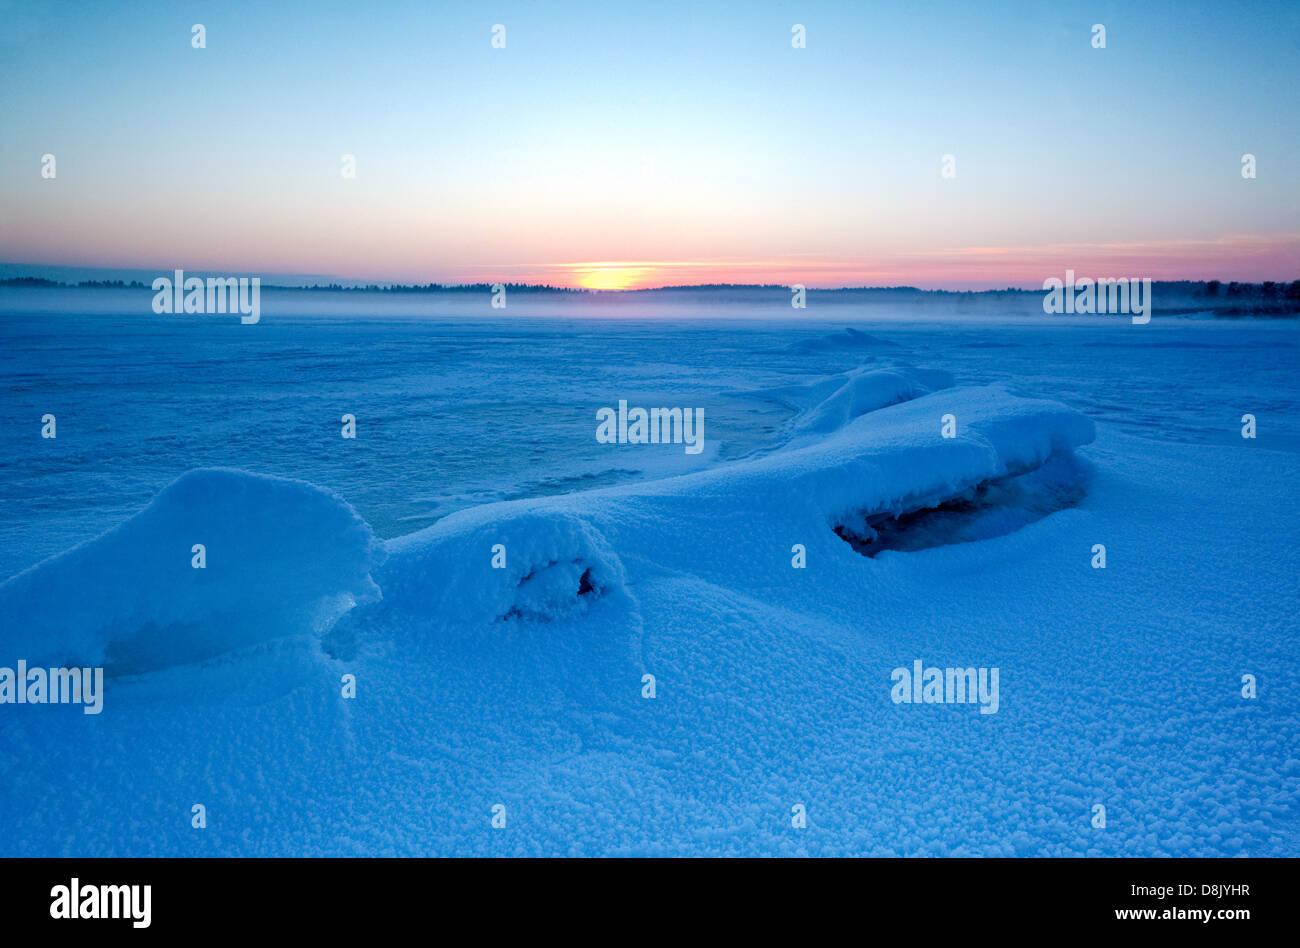 Winter-Sonnenuntergang am Moskjæra in den See Vansjø, Råde Kommune, Østfold Fylke, Norwegen. Stockbild